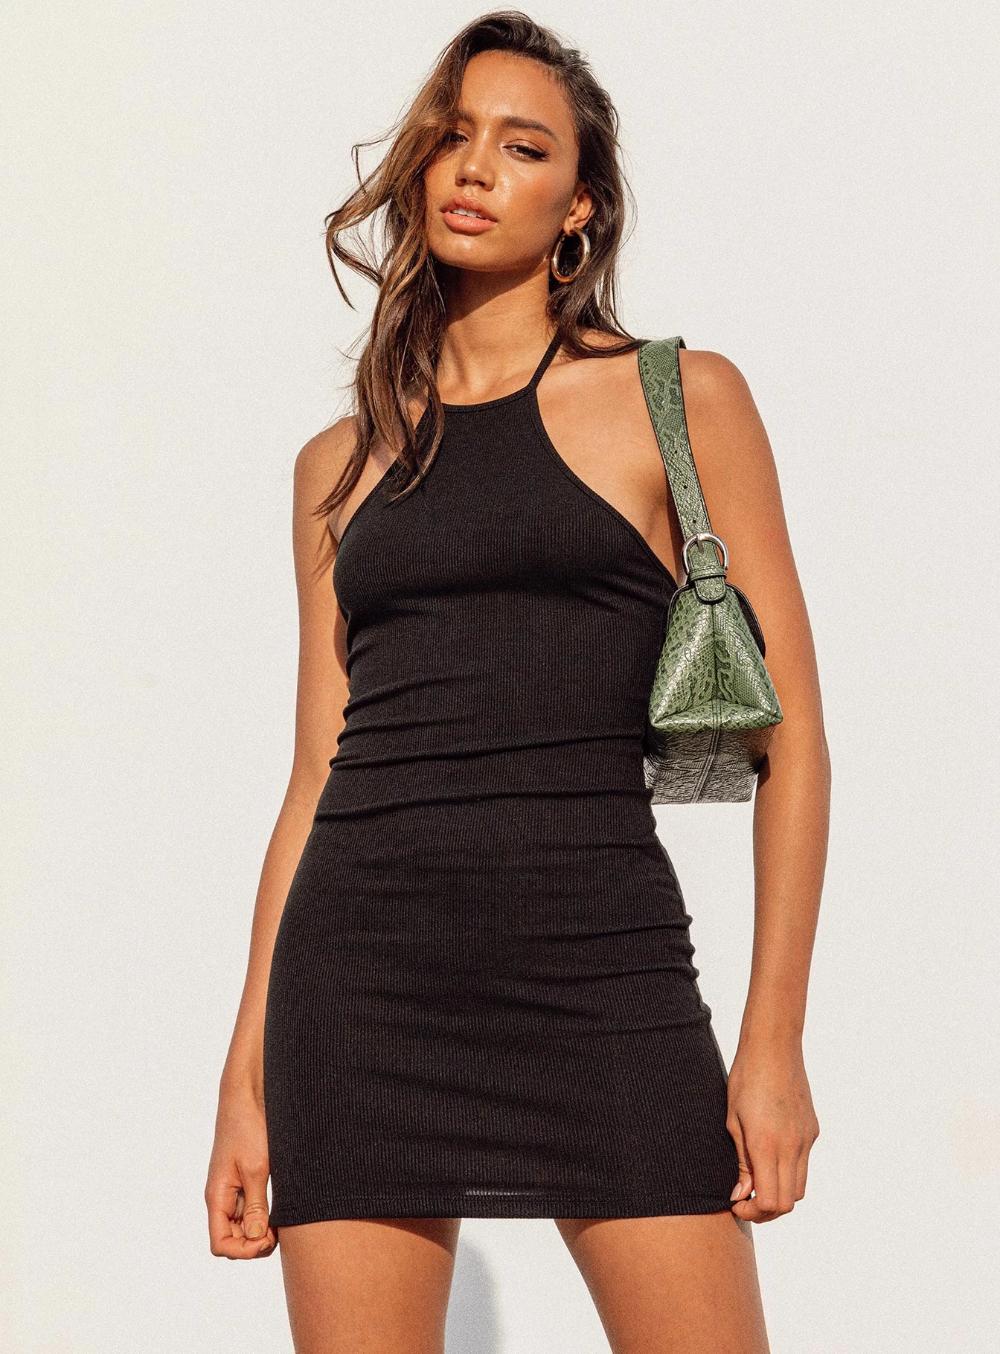 The Dex Mini Dress Princess Polly Aus Mini Dress Dresses Black Dresses Online [ 1354 x 1000 Pixel ]